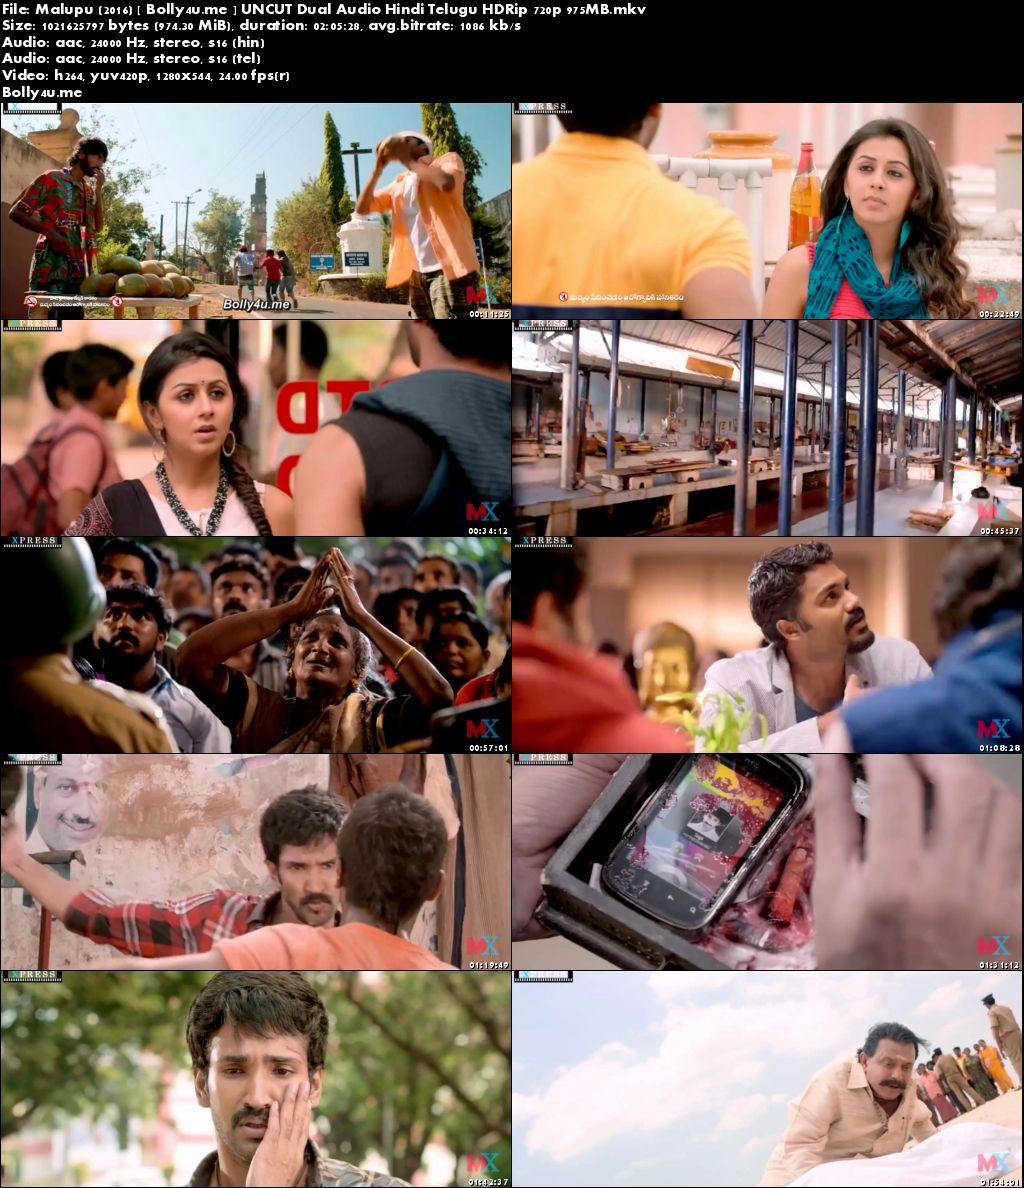 Malupu 2016 HDRip 400MB UNCUT Hindi Dual Audio 480p Download